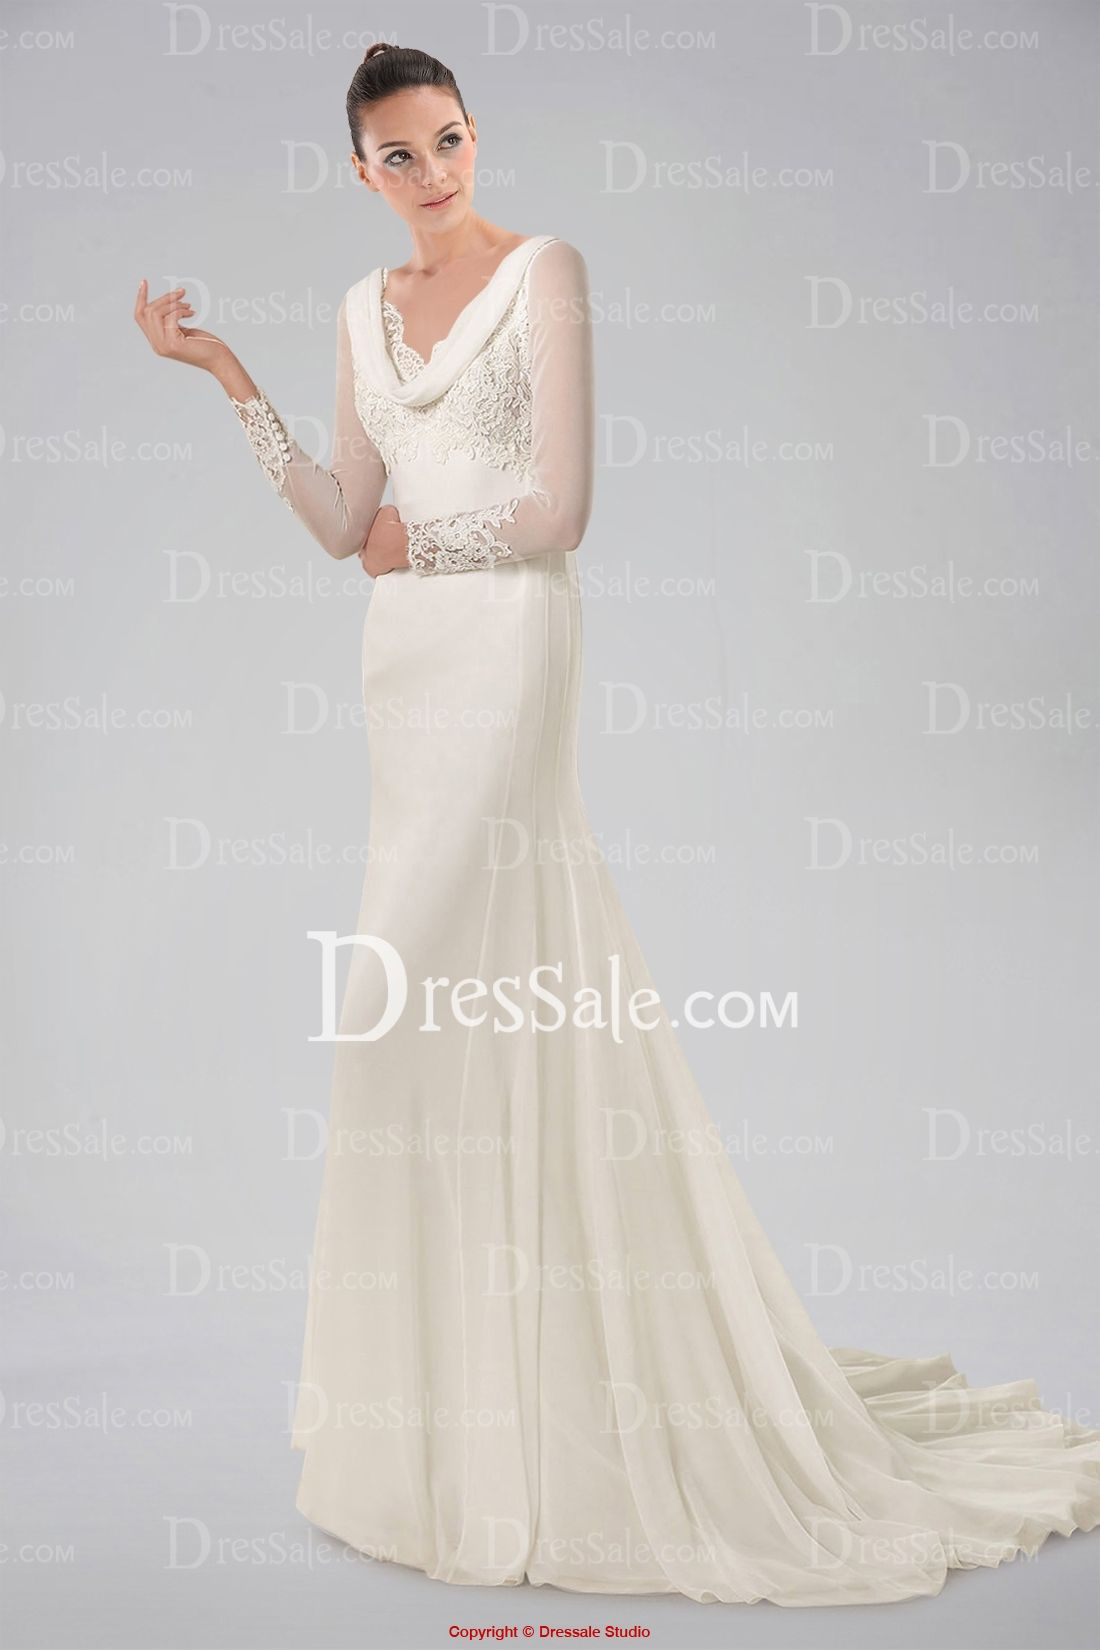 Long sleeve chiffon wedding dress  Stunning Long Illusion Sleeve Chiffon Wedding Dress with Appliques